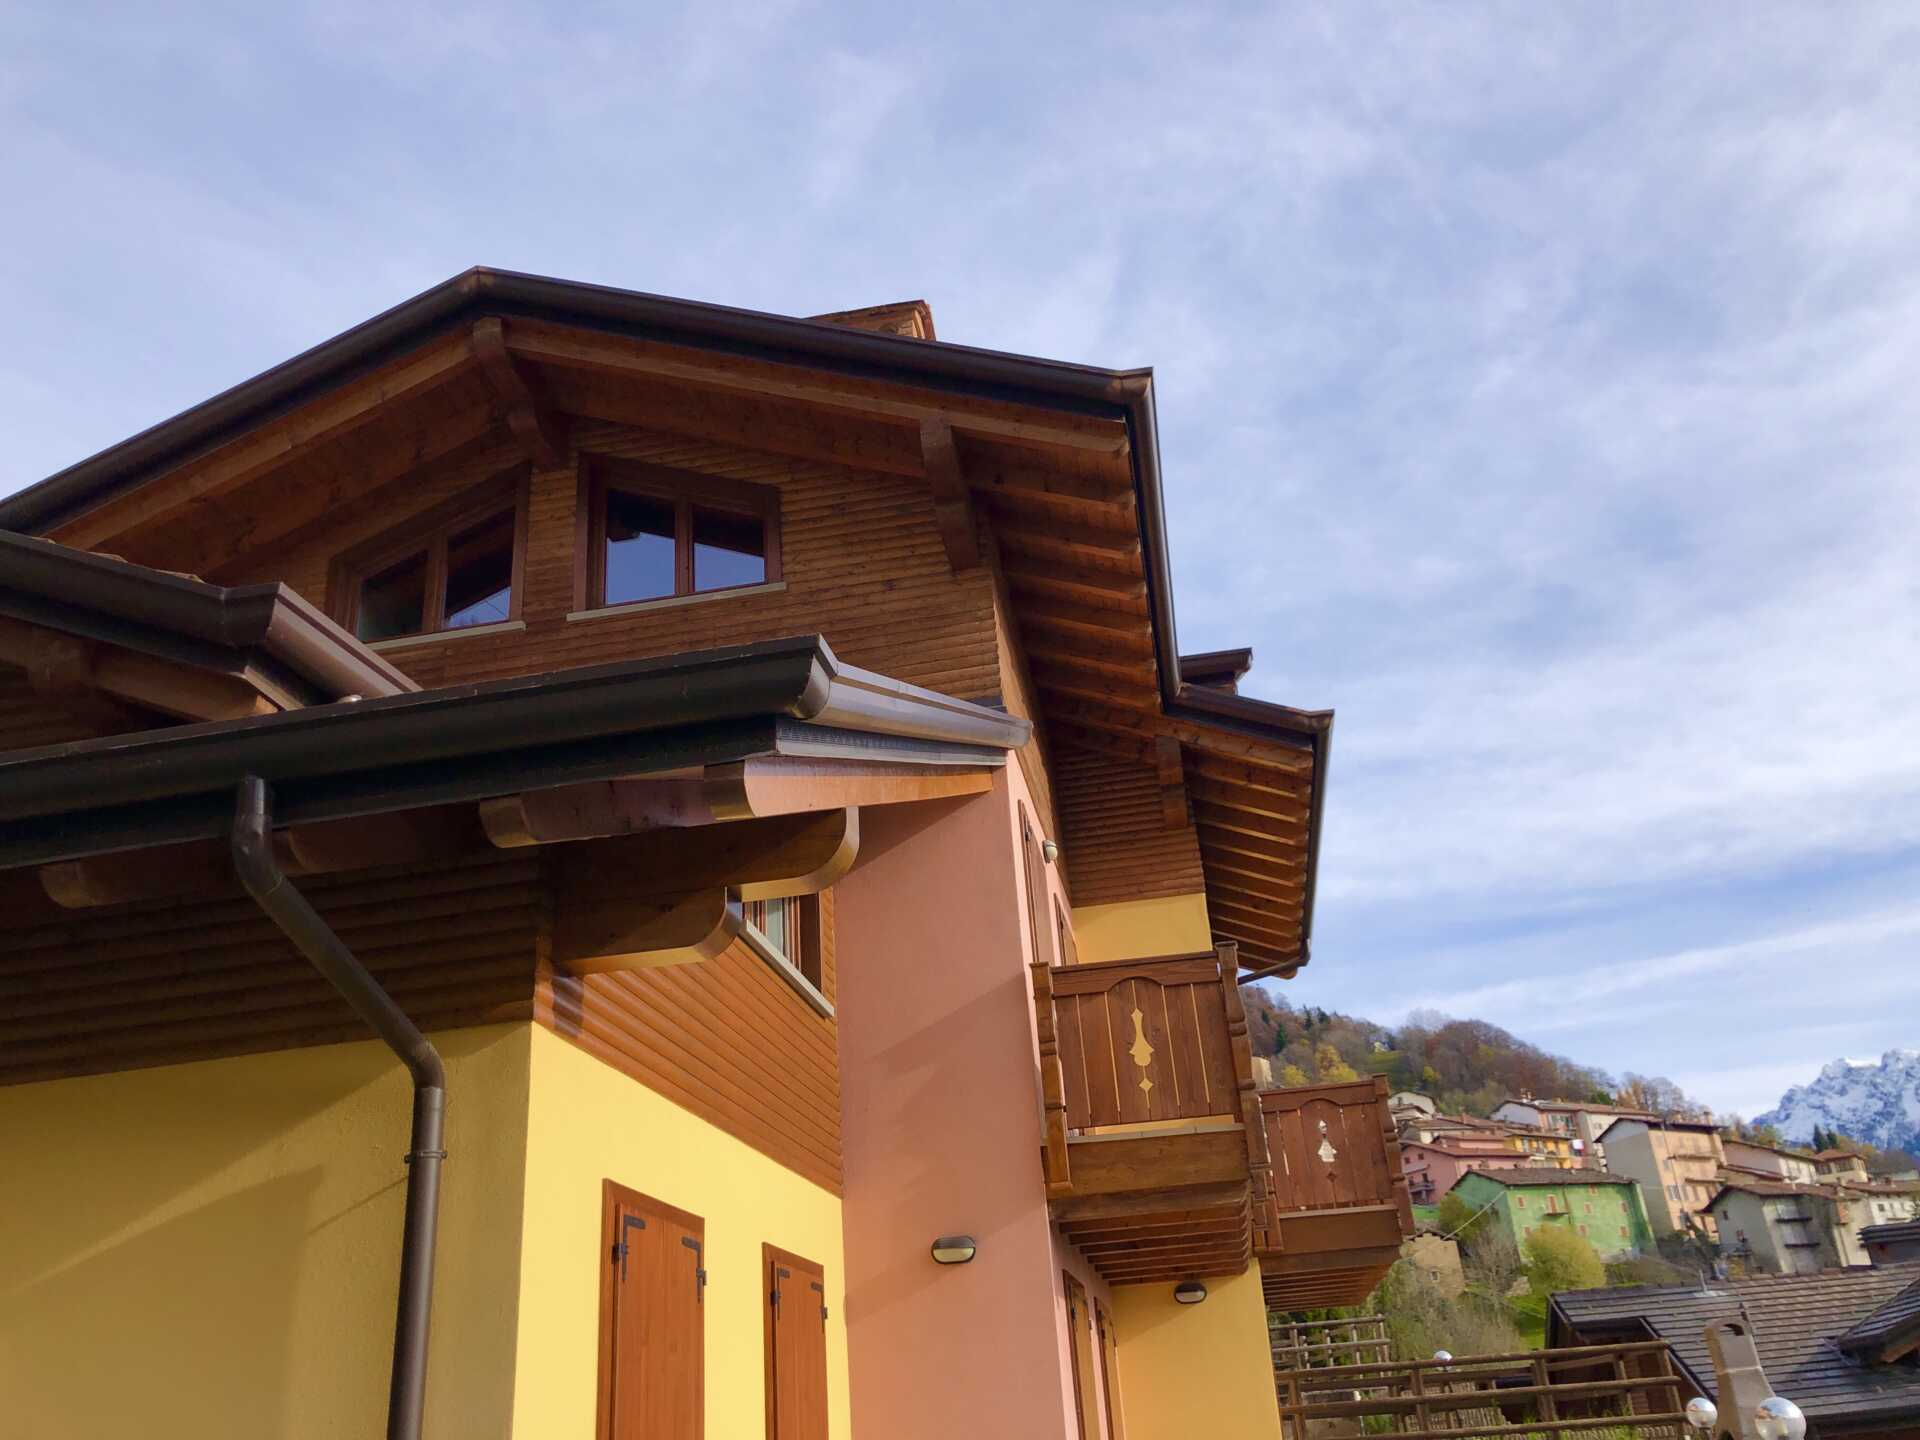 Casa-vacanze-in-vendita-appartamento-a-Dossena (10)